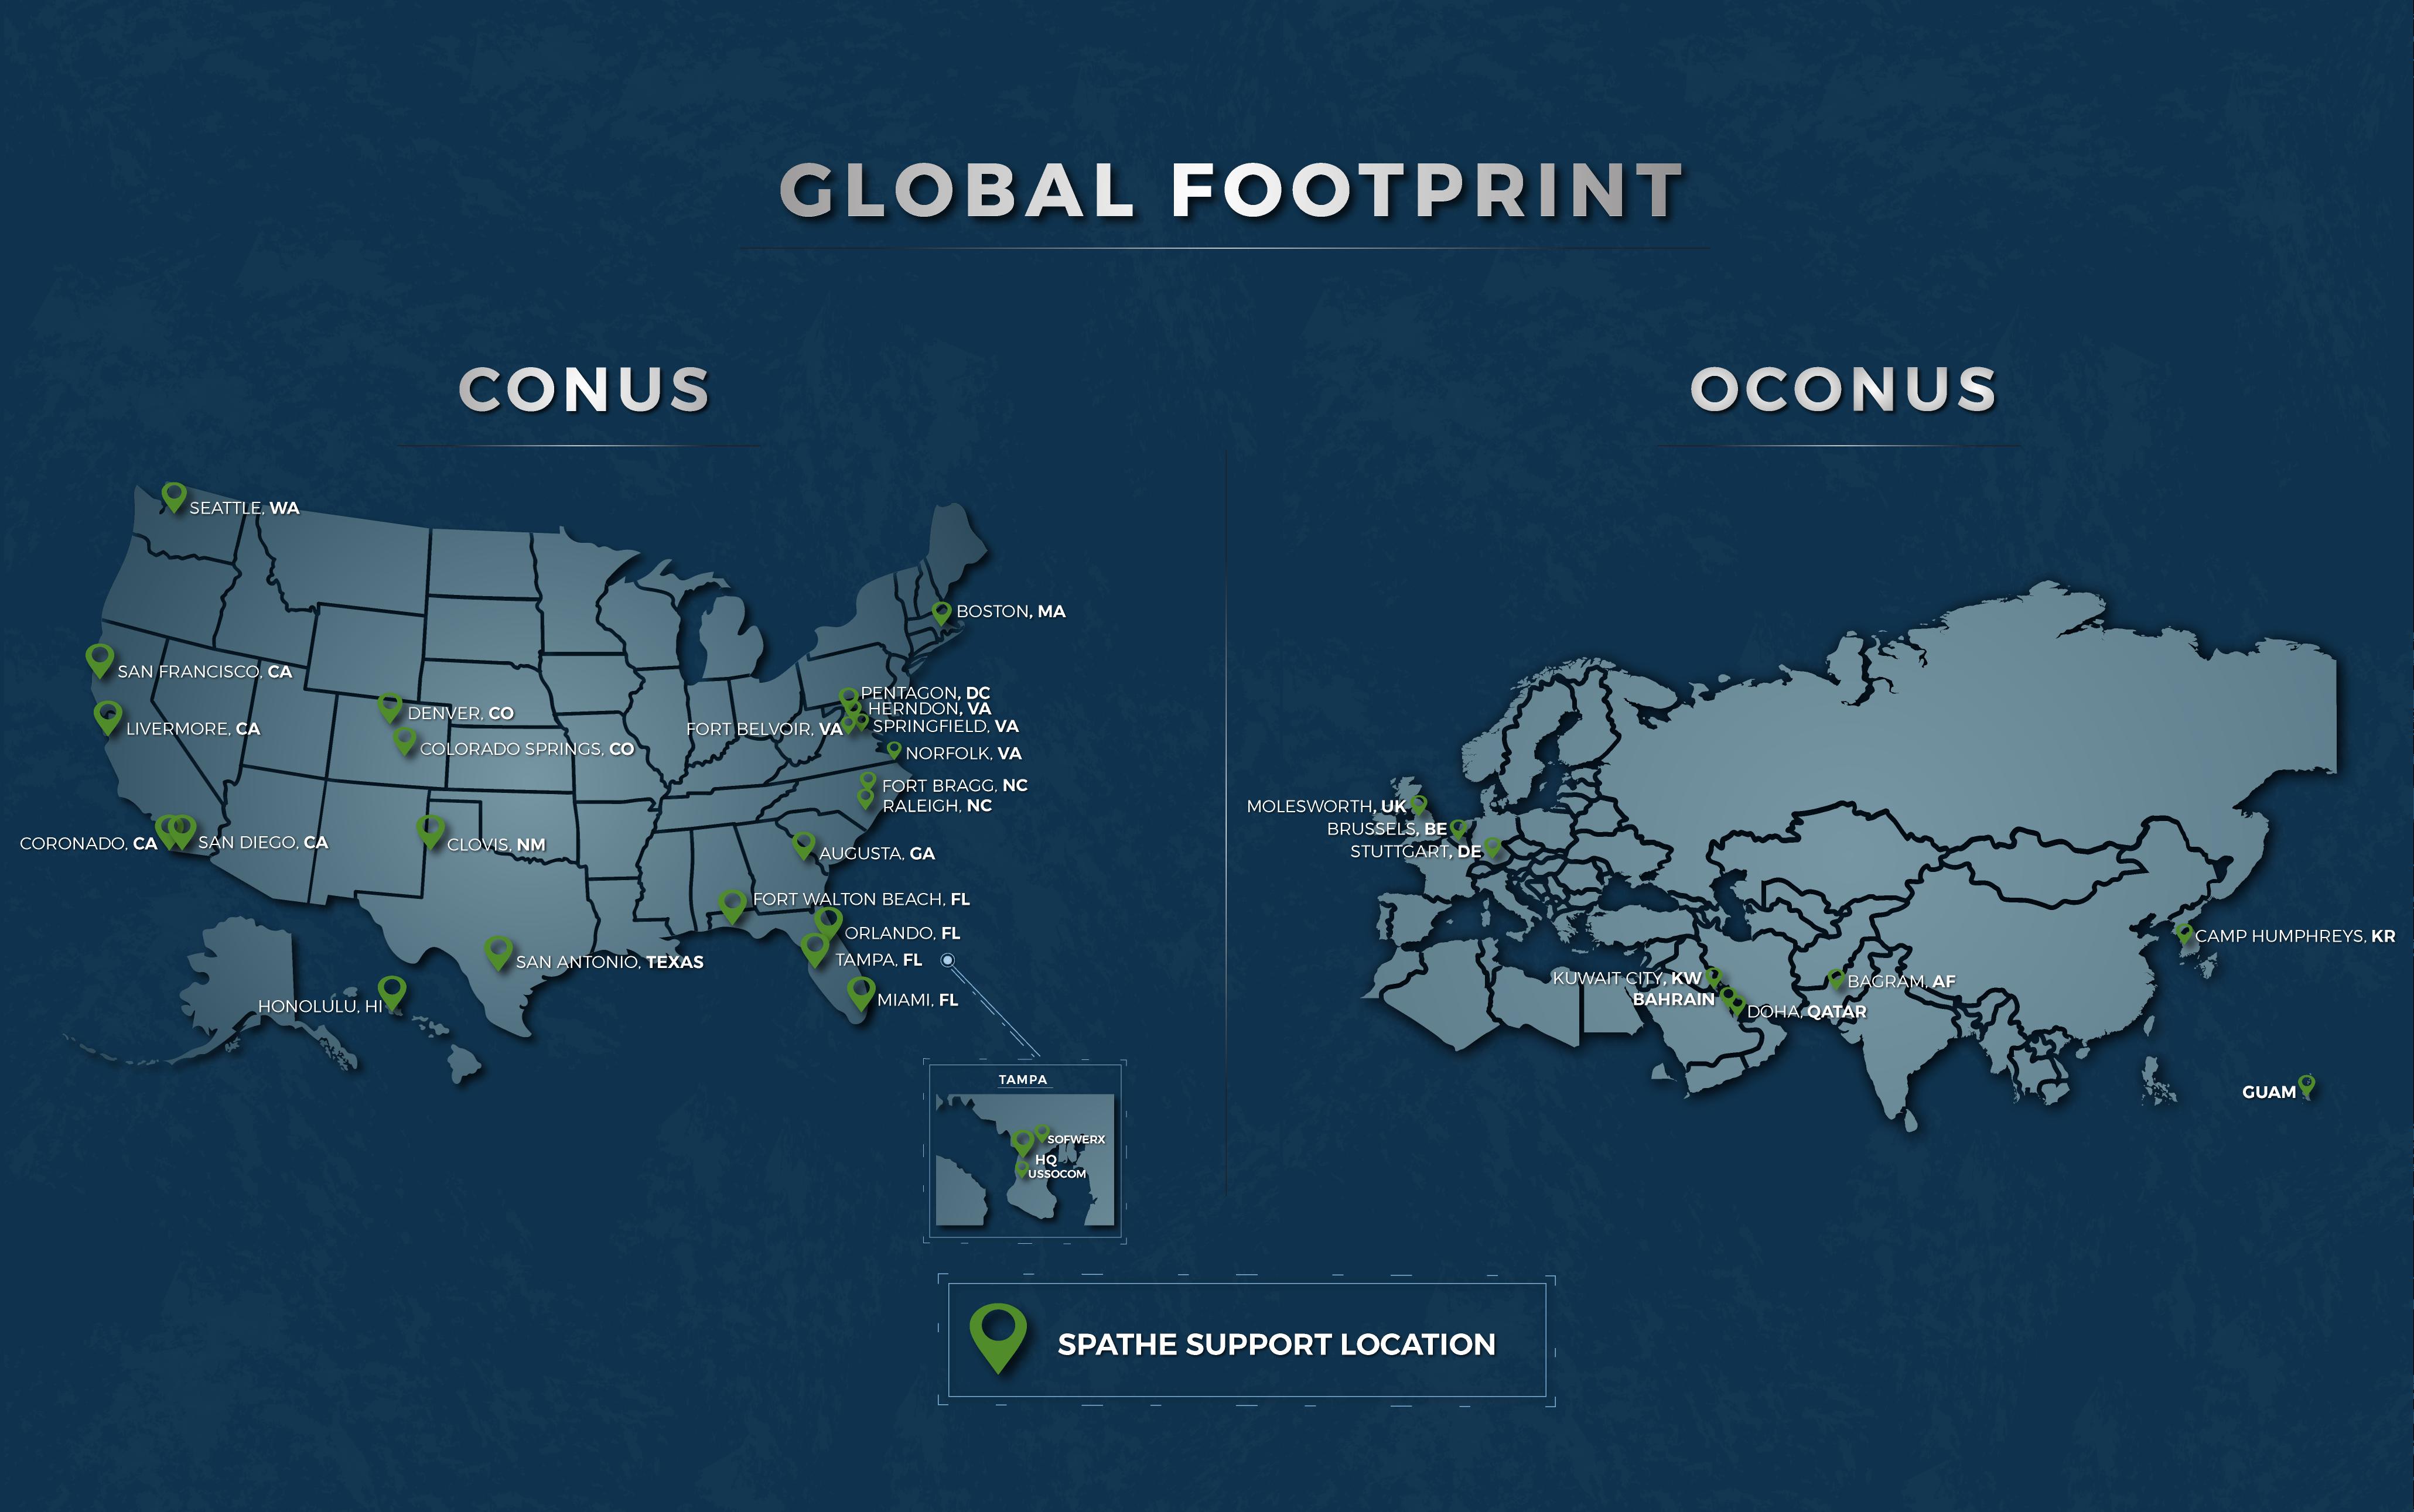 spathe, oconus, conus, global footprint, support, spathe support